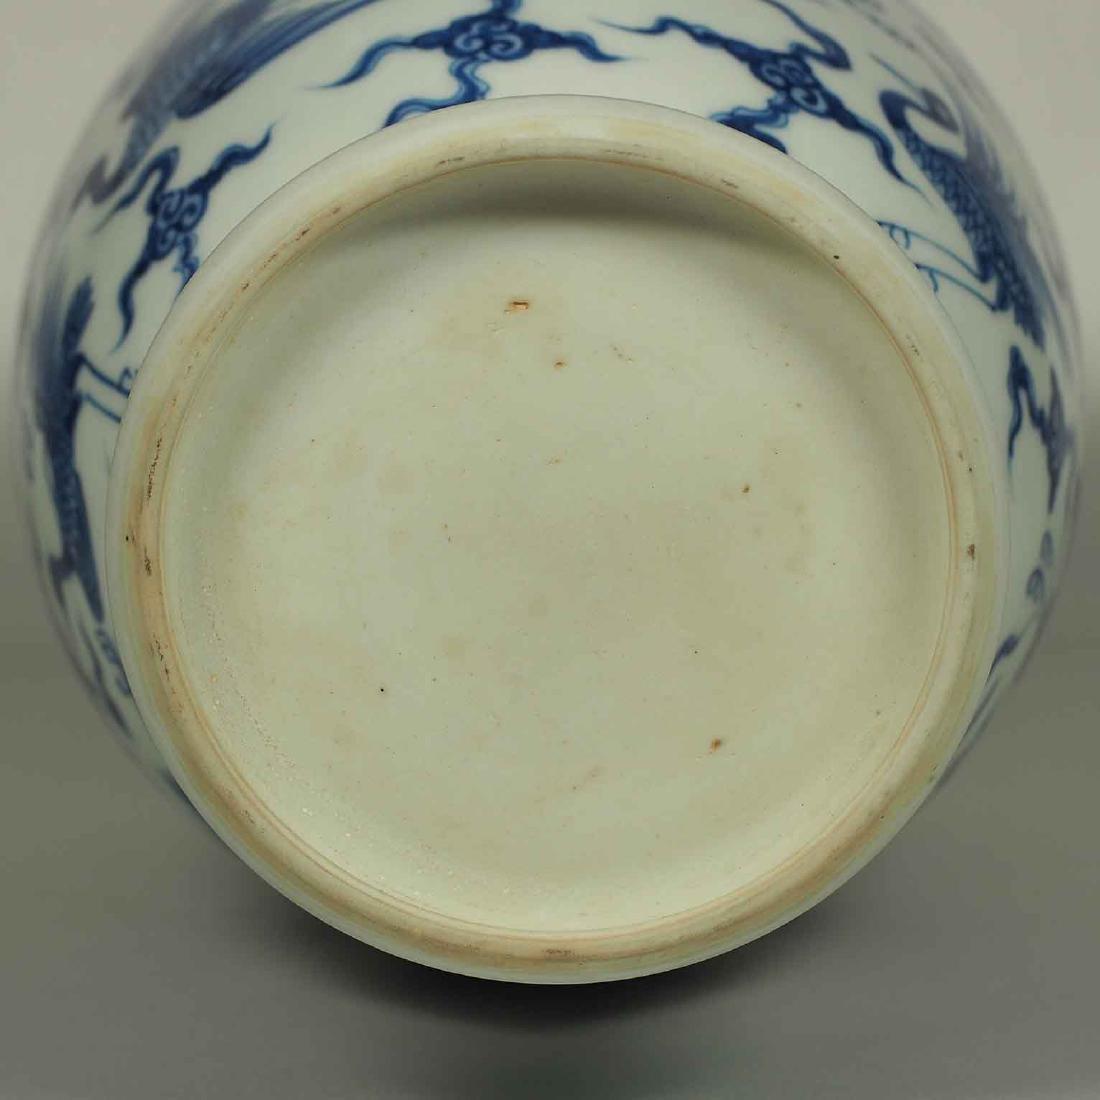 Vase with Flying Cranes Design, Ming Dynasty - 8